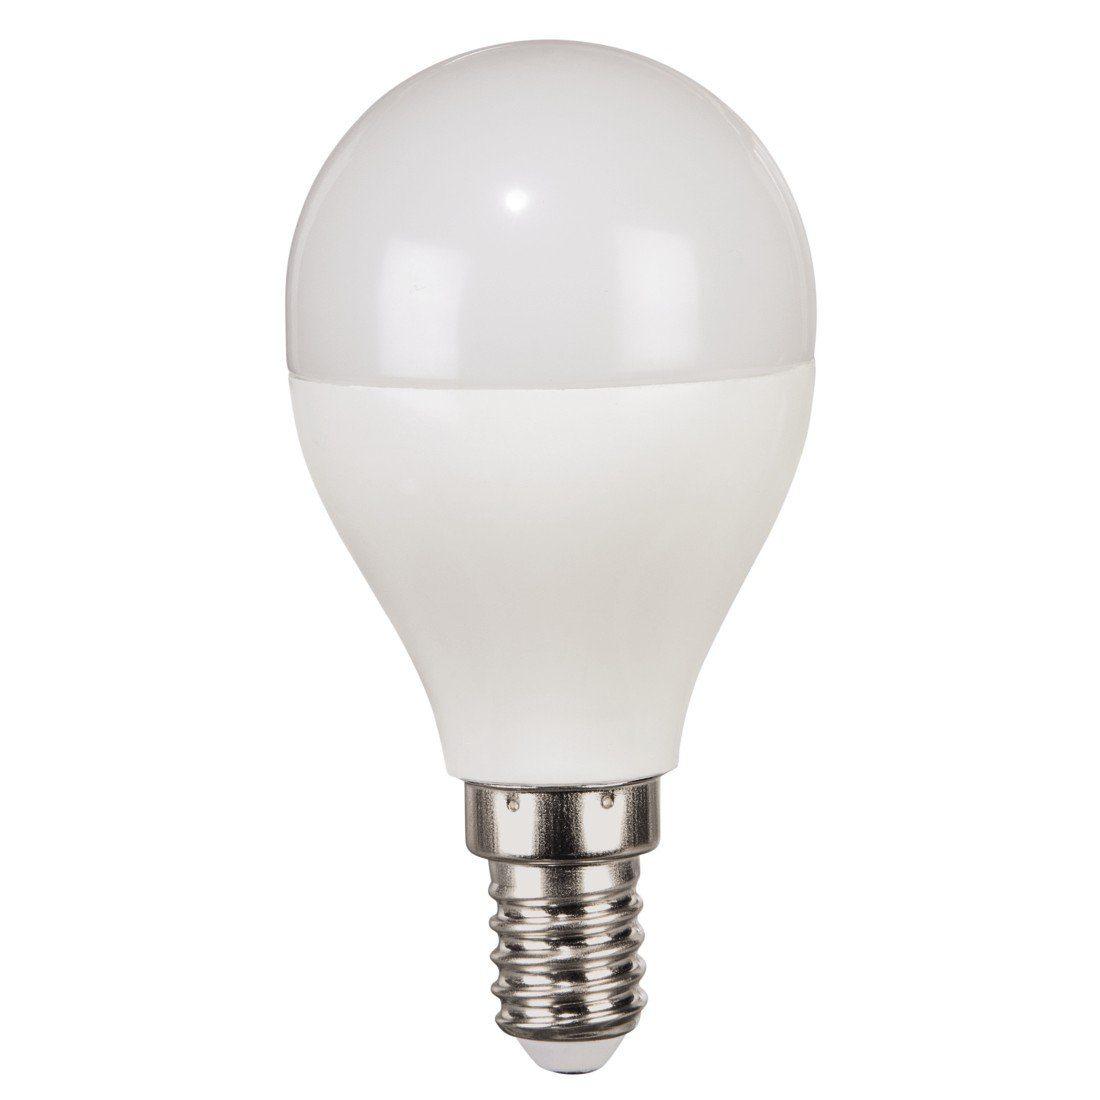 Xavax High Line LED-Lampe, 6,9W, Tropfenform, E14, Warmweiß, RA90